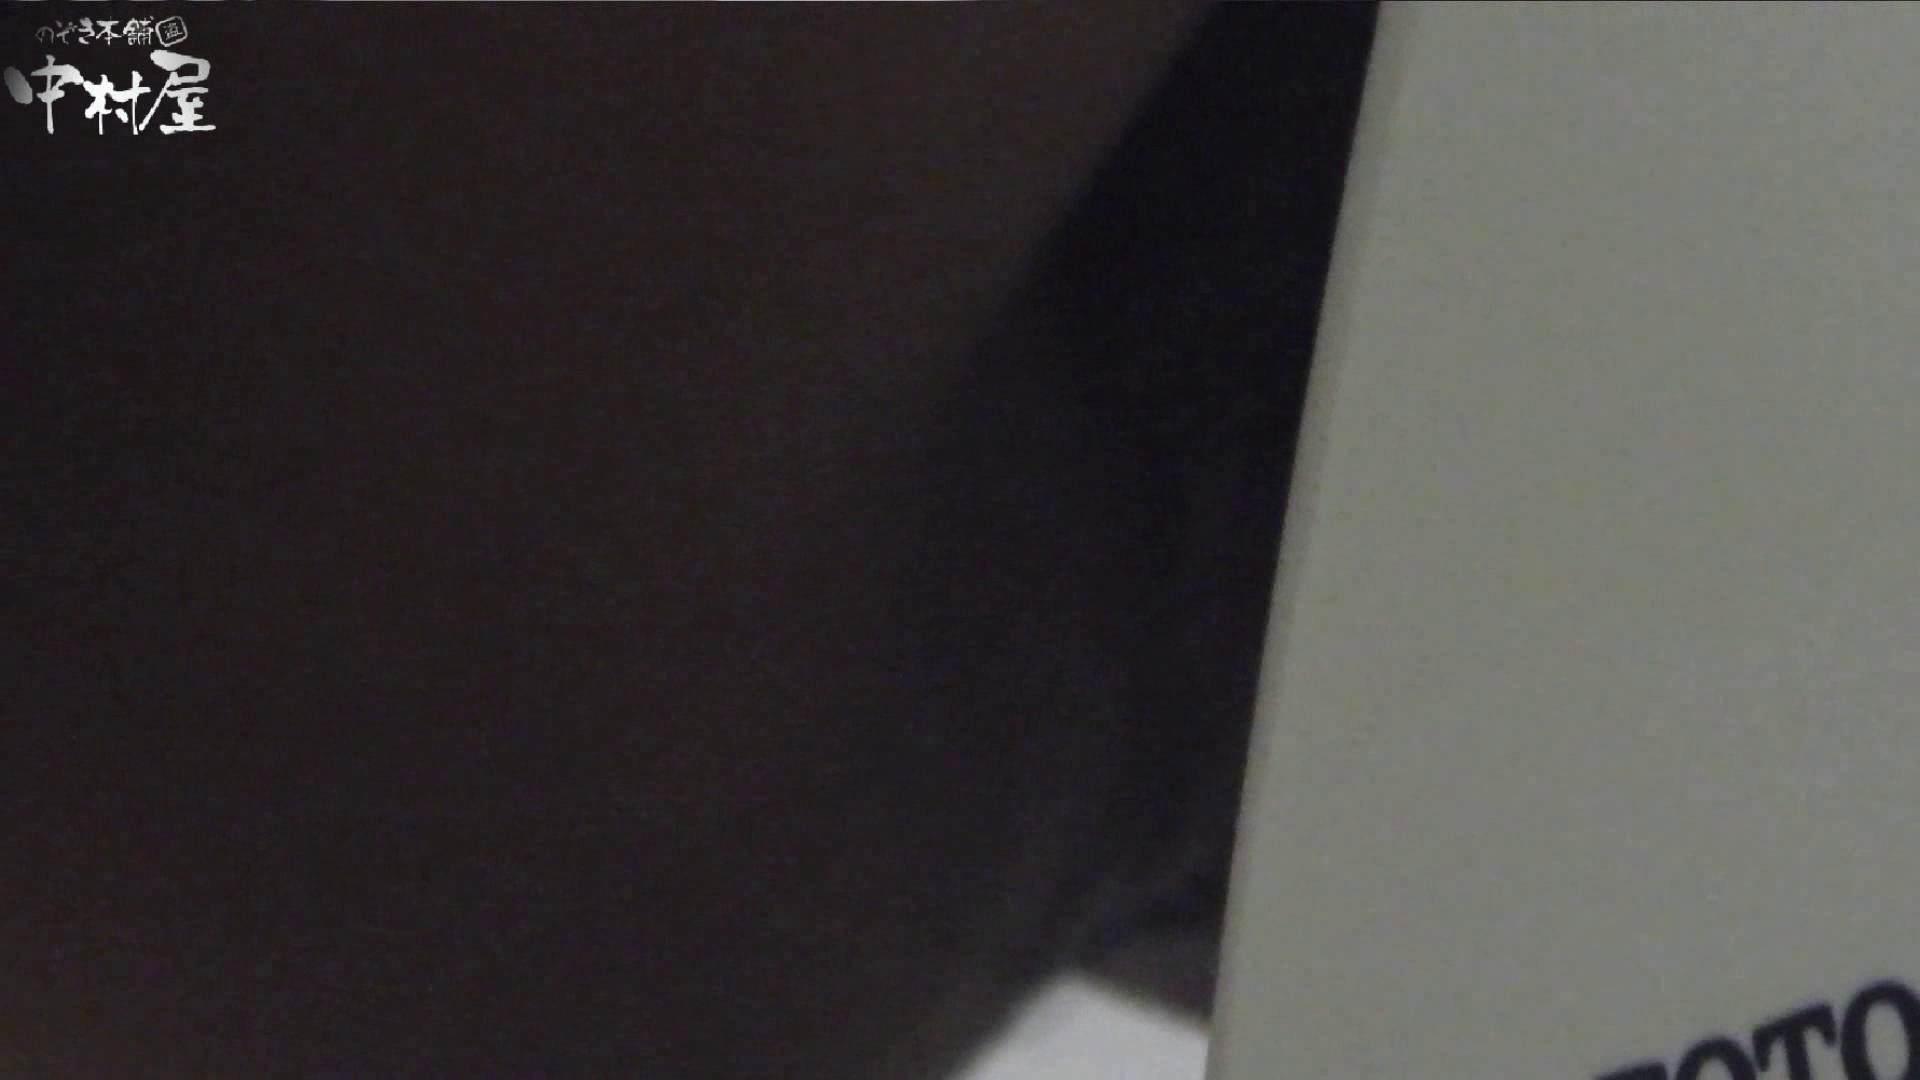 vol.43 命がけ潜伏洗面所! 黄色いTシャツの桃尻さん 潜入 AV無料動画キャプチャ 76PIX 47